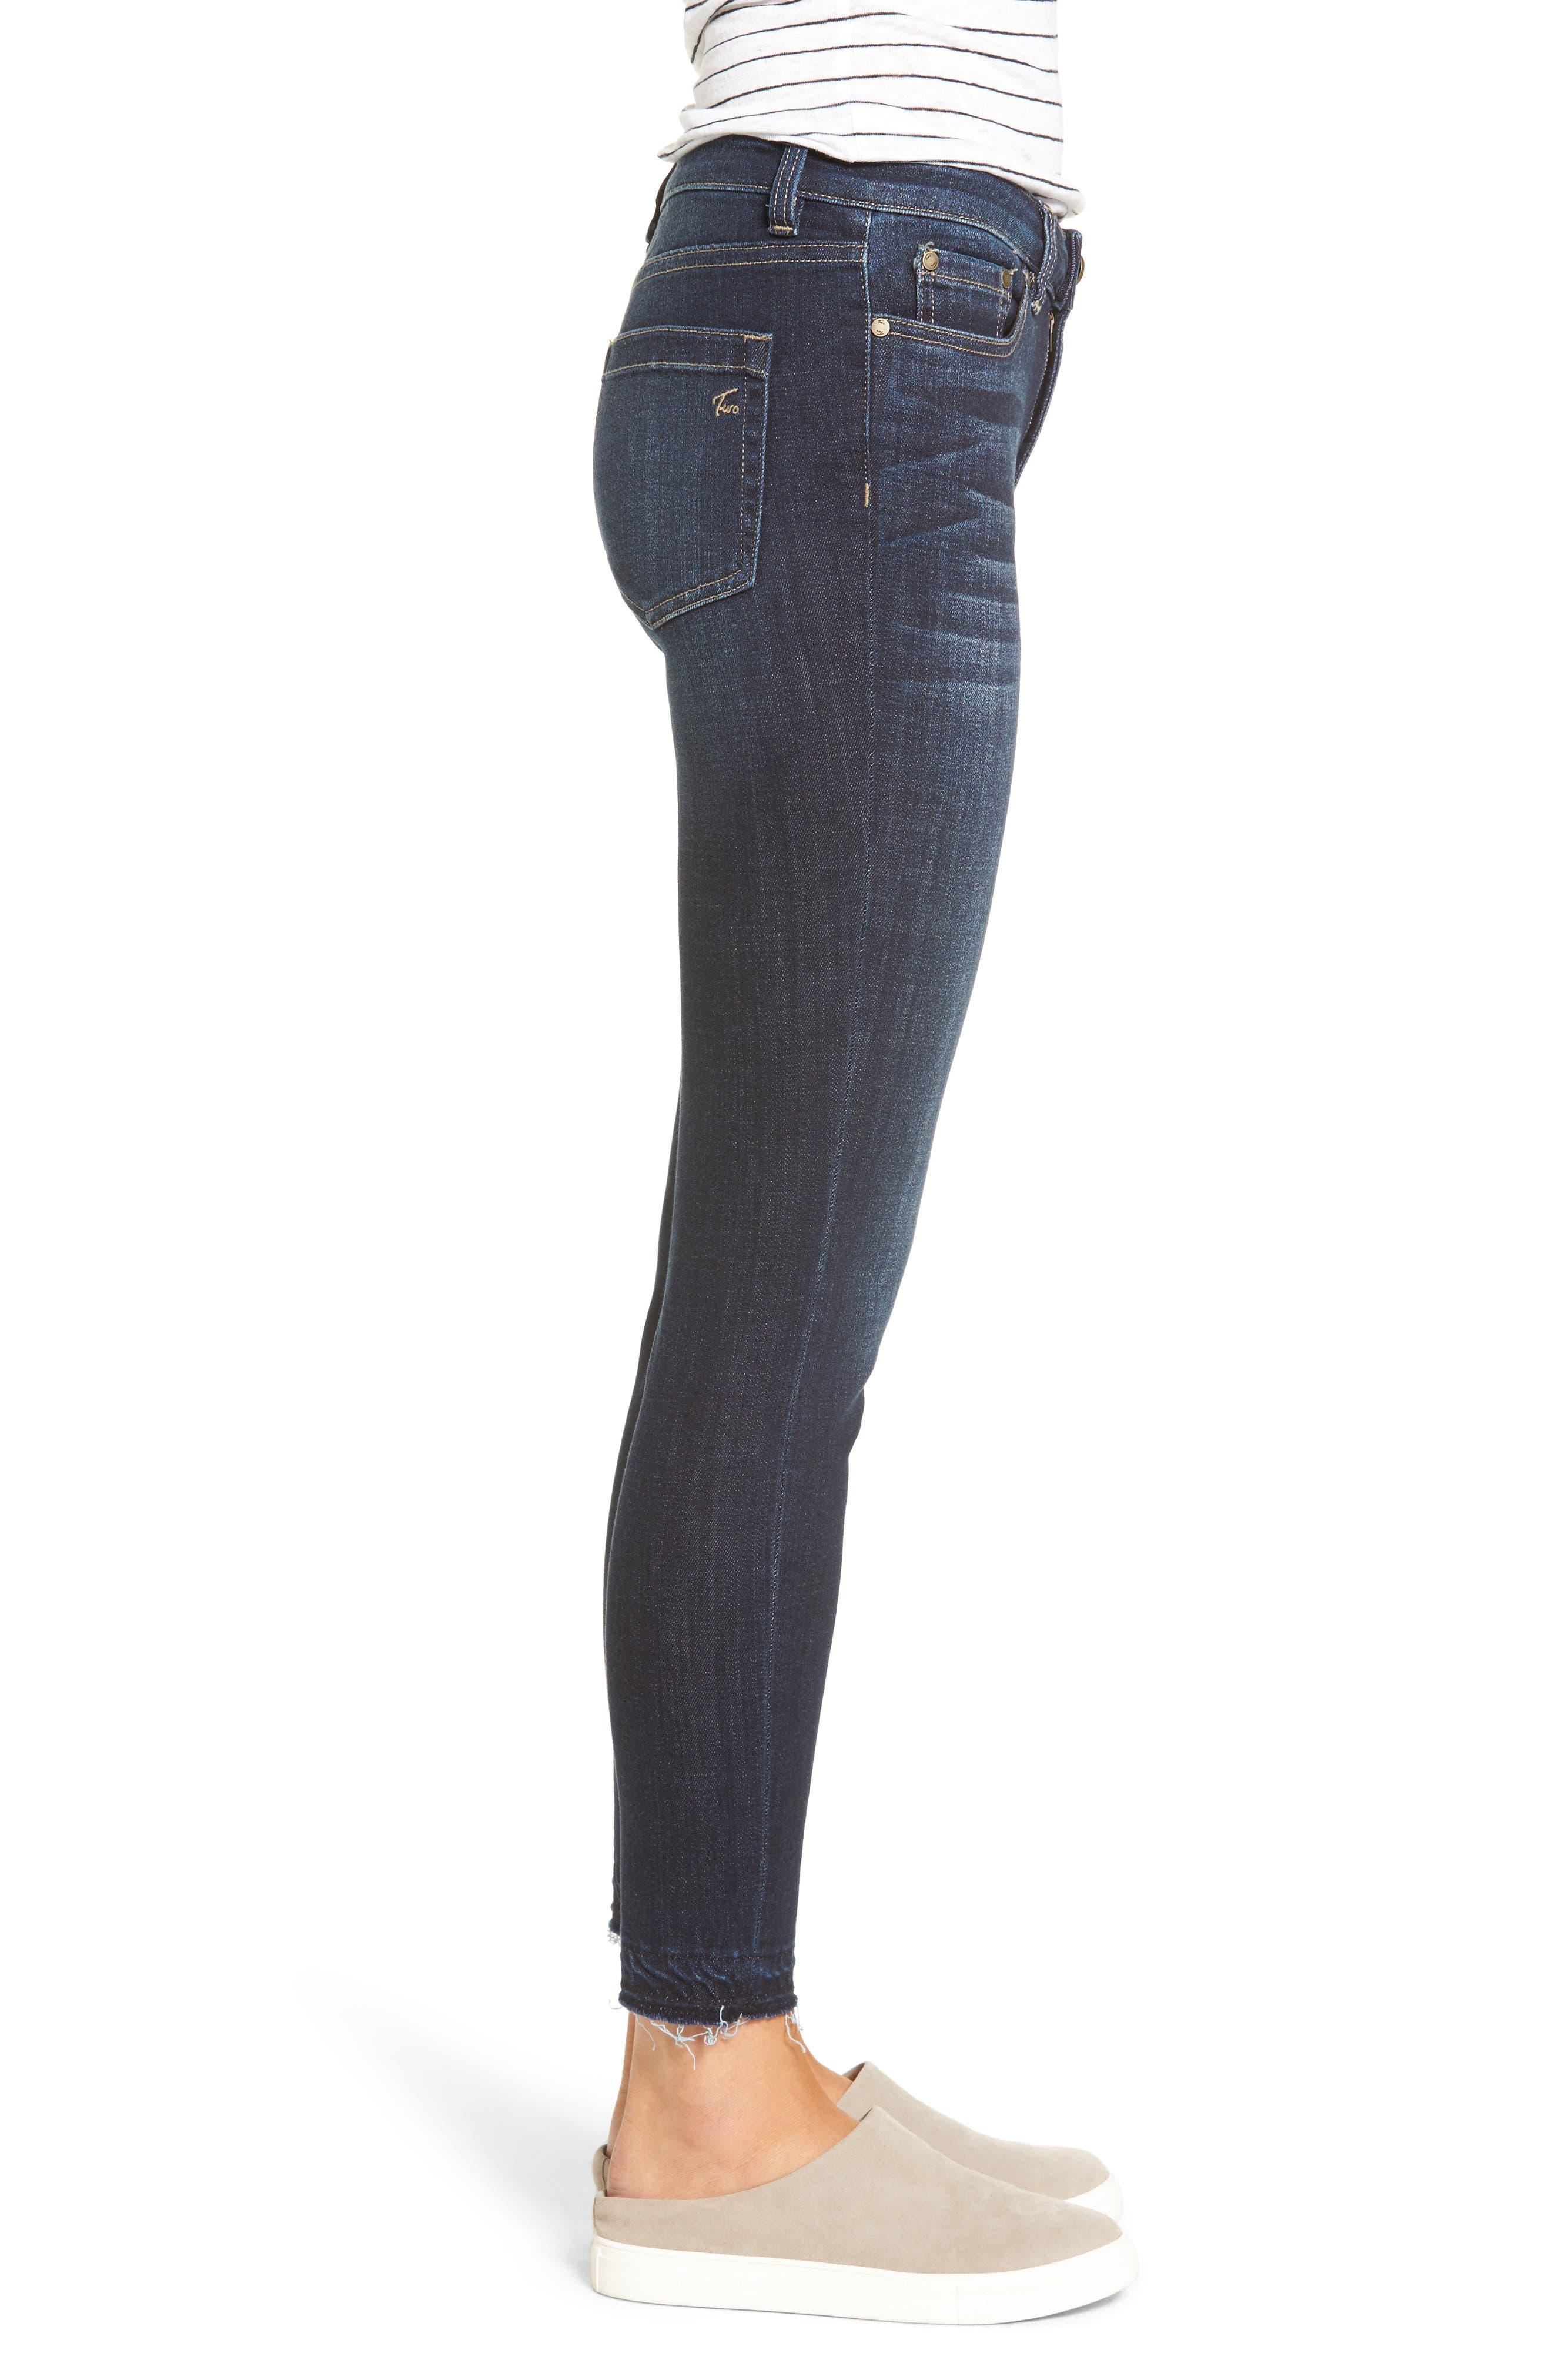 Release Hem Skinny Jeans,                             Alternate thumbnail 3, color,                             DARK AUTHENTIC